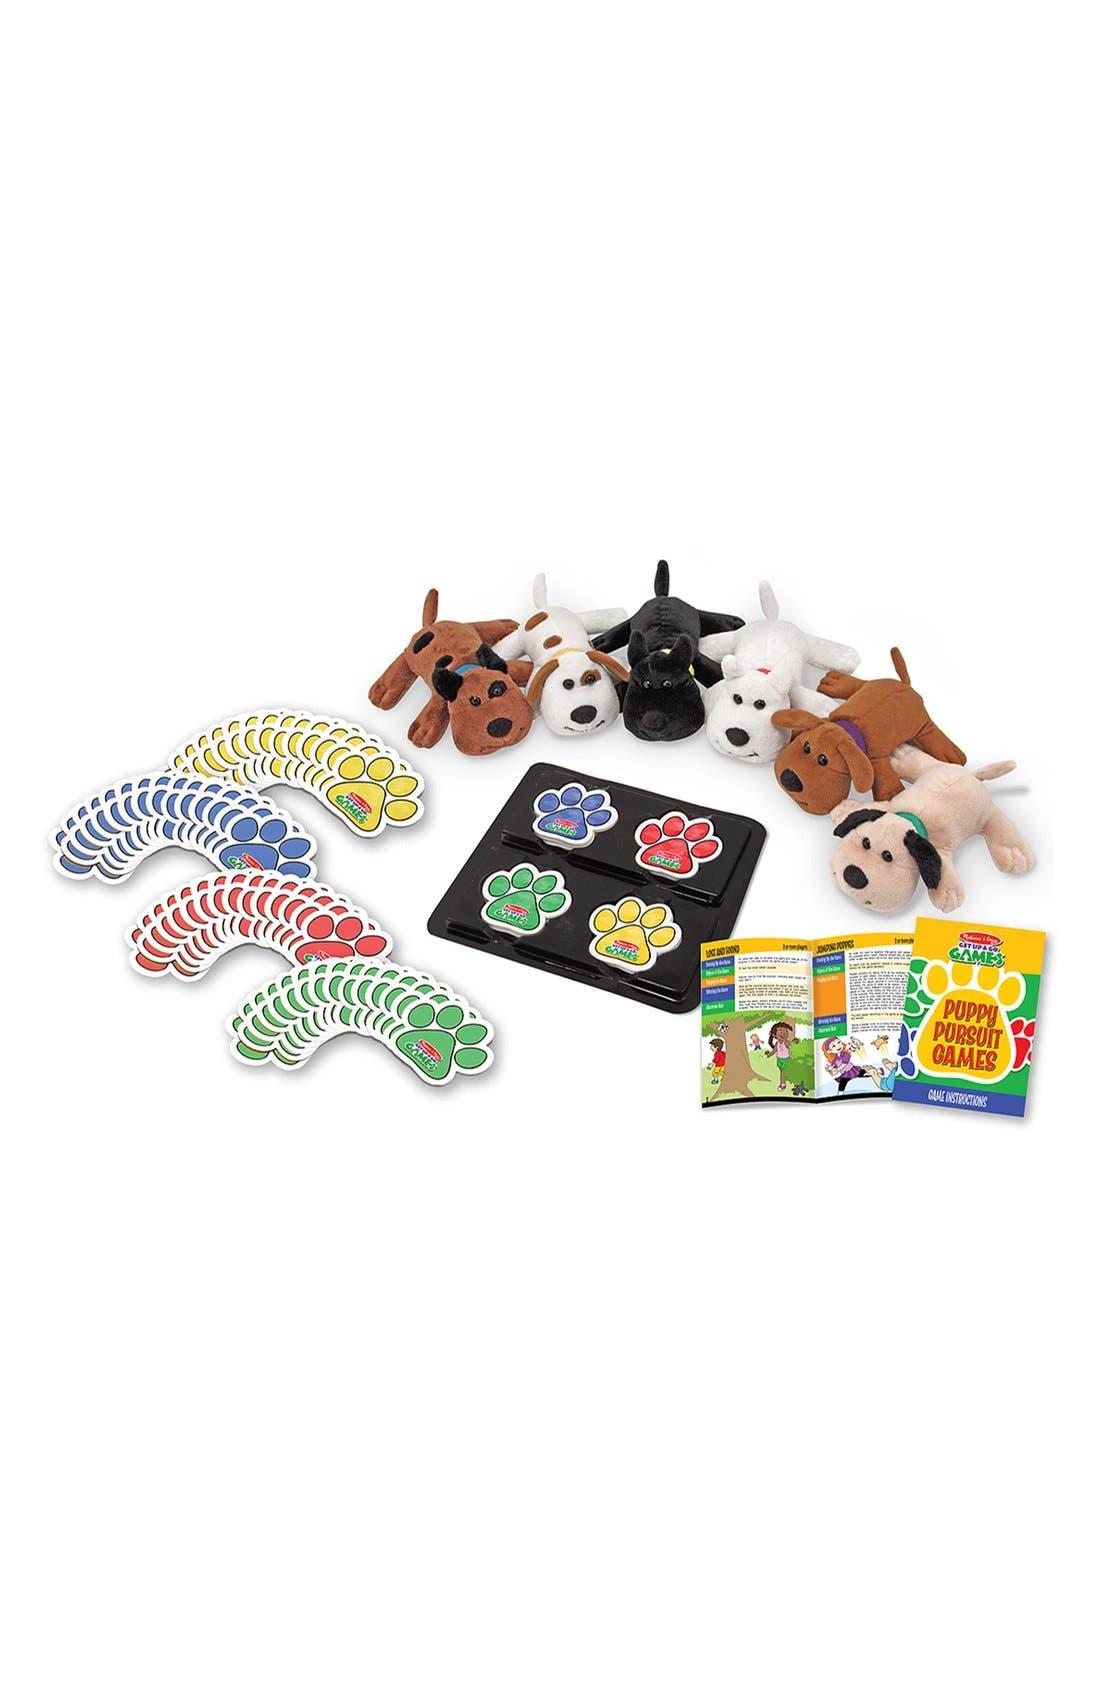 Alternate Image 1 Selected - Melissa & Doug 'Puppy Pursuit' Game Set